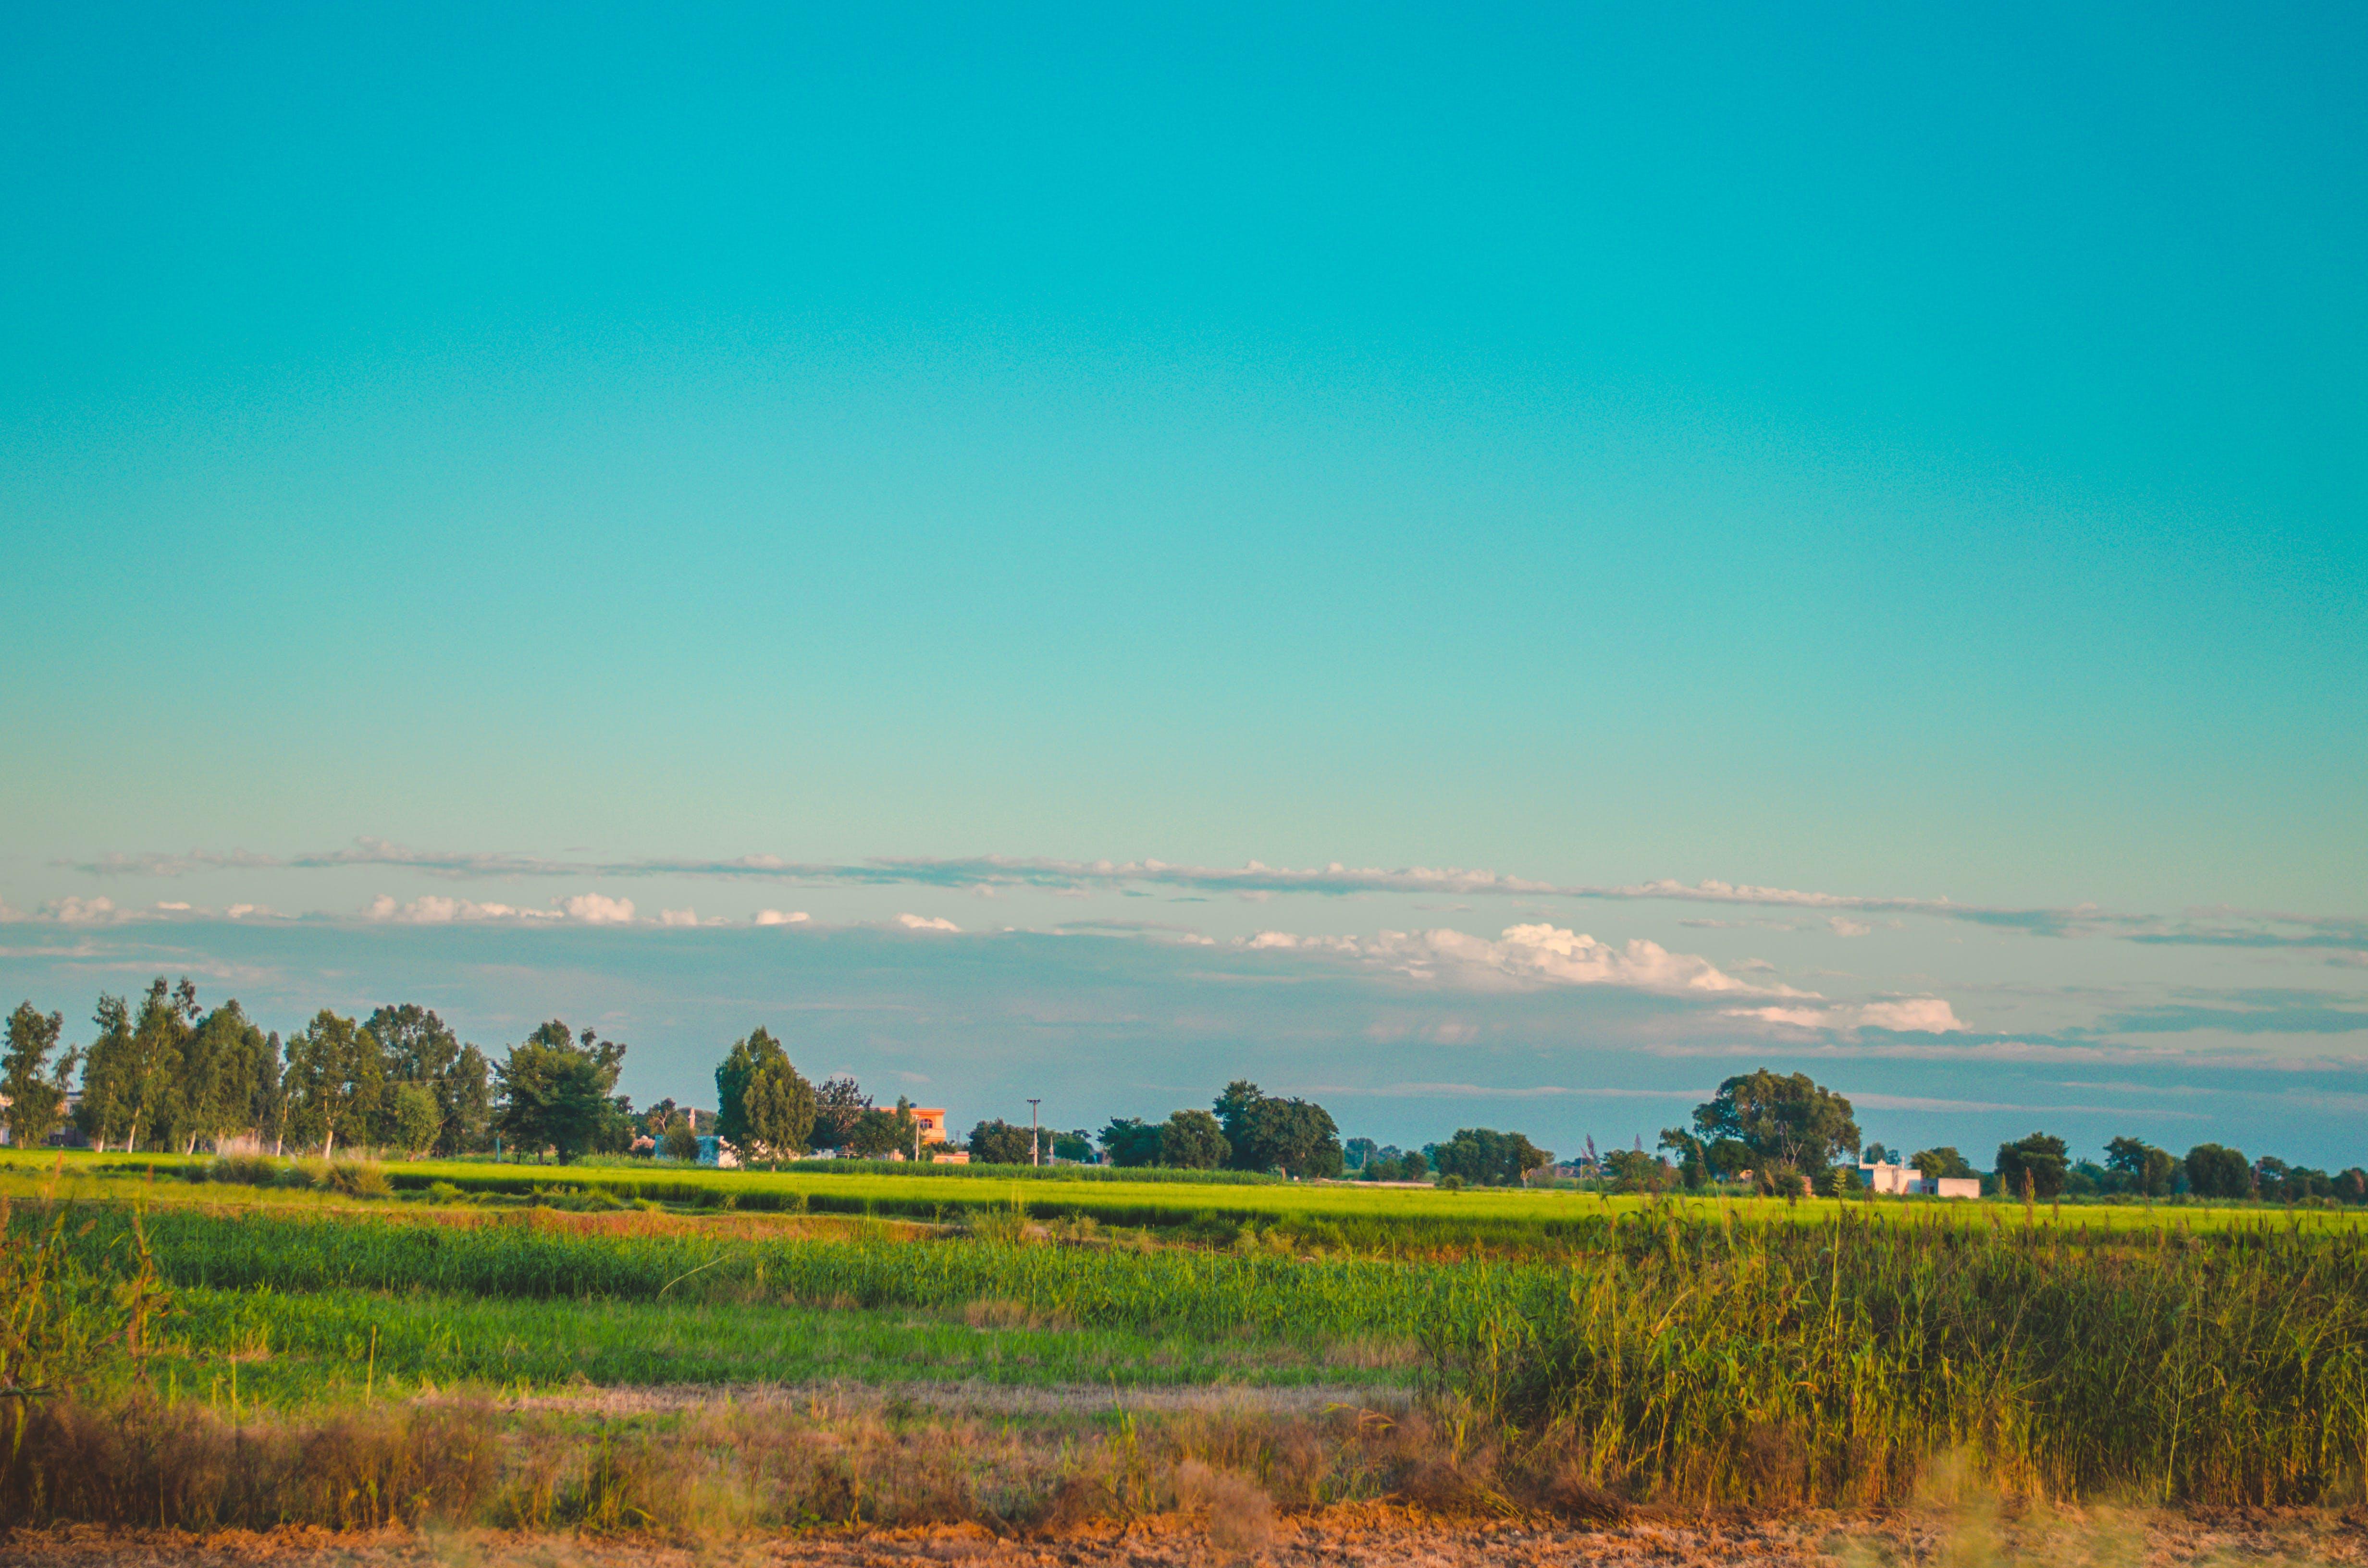 Free stock photo of #outdoorchallenge, background, blue background, blue skies